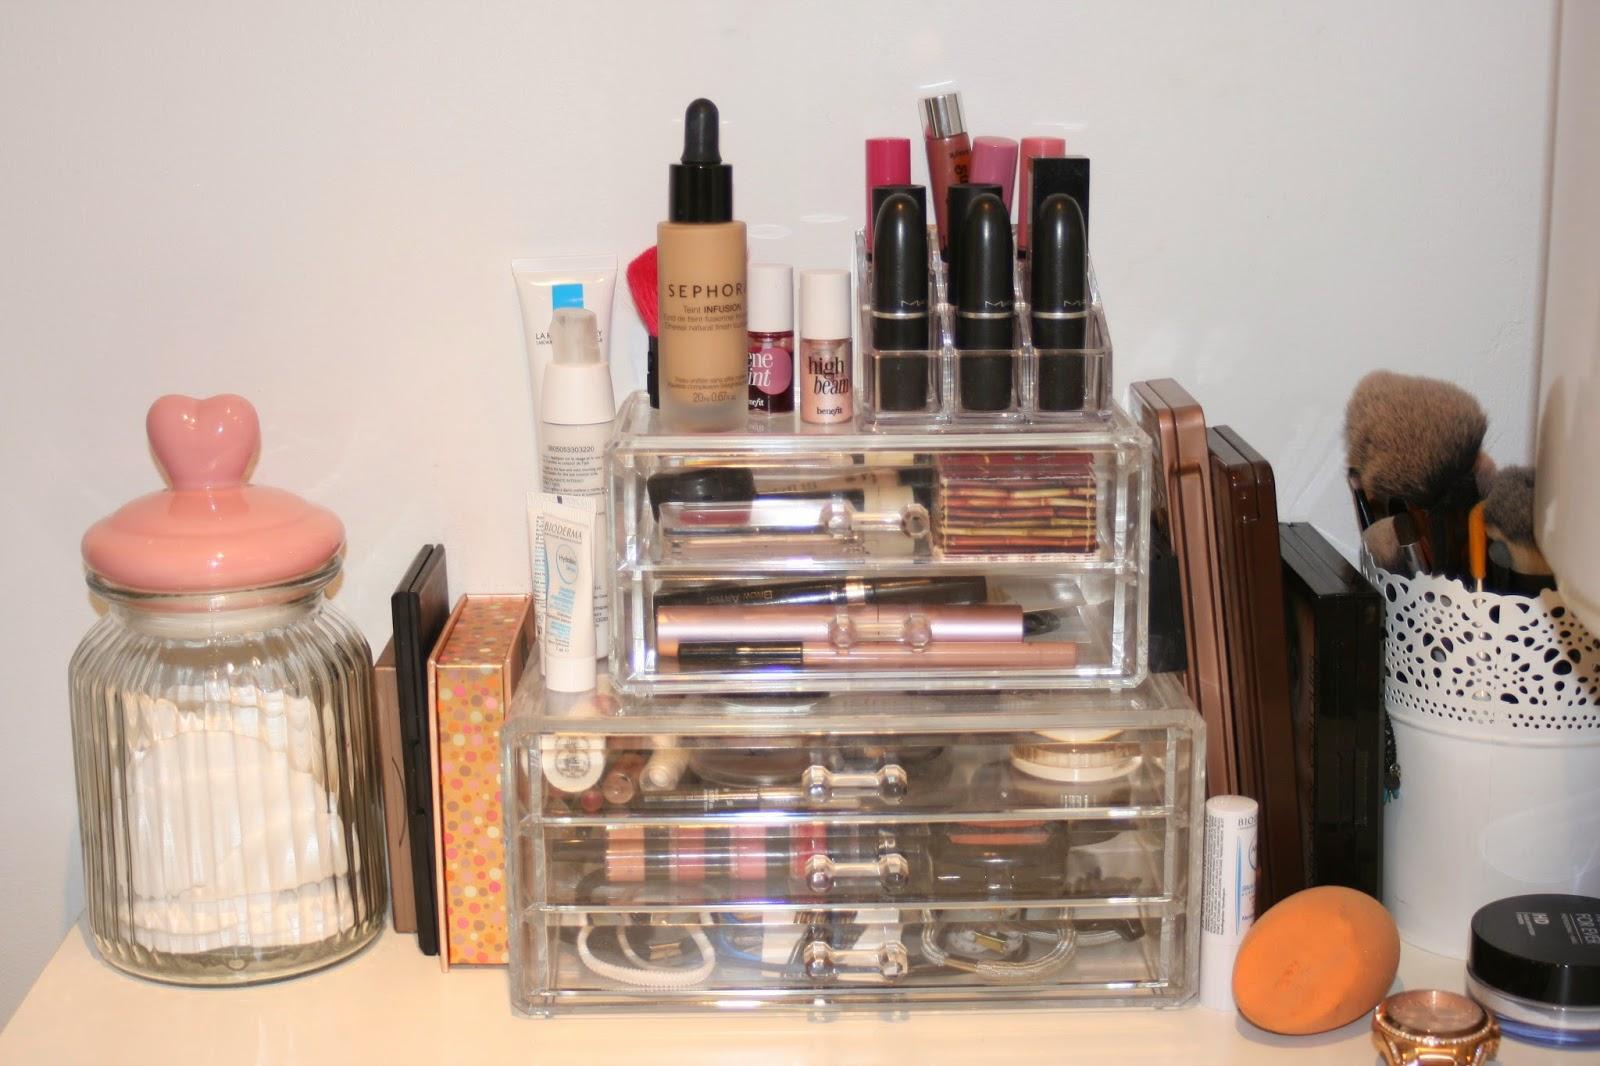 astuces n 1 comment ranger son make up id es de rangement maquillage les papoteuses. Black Bedroom Furniture Sets. Home Design Ideas